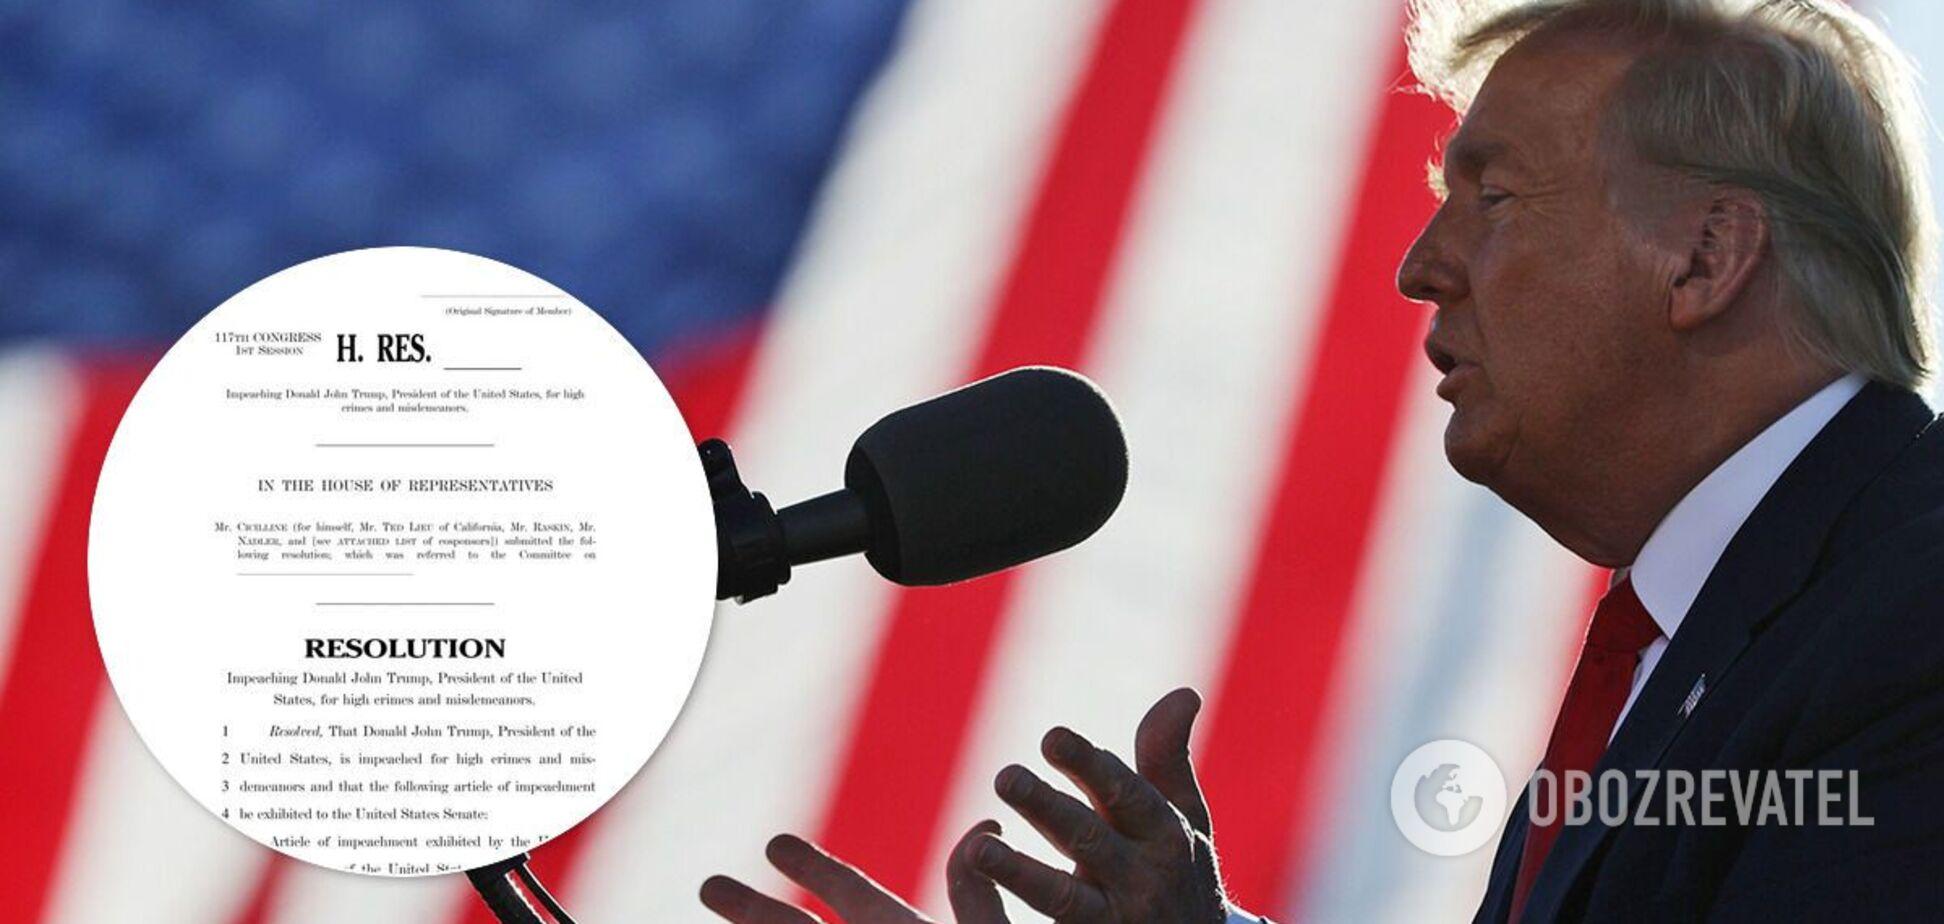 Опубликована резолюция об импичменте Трампа